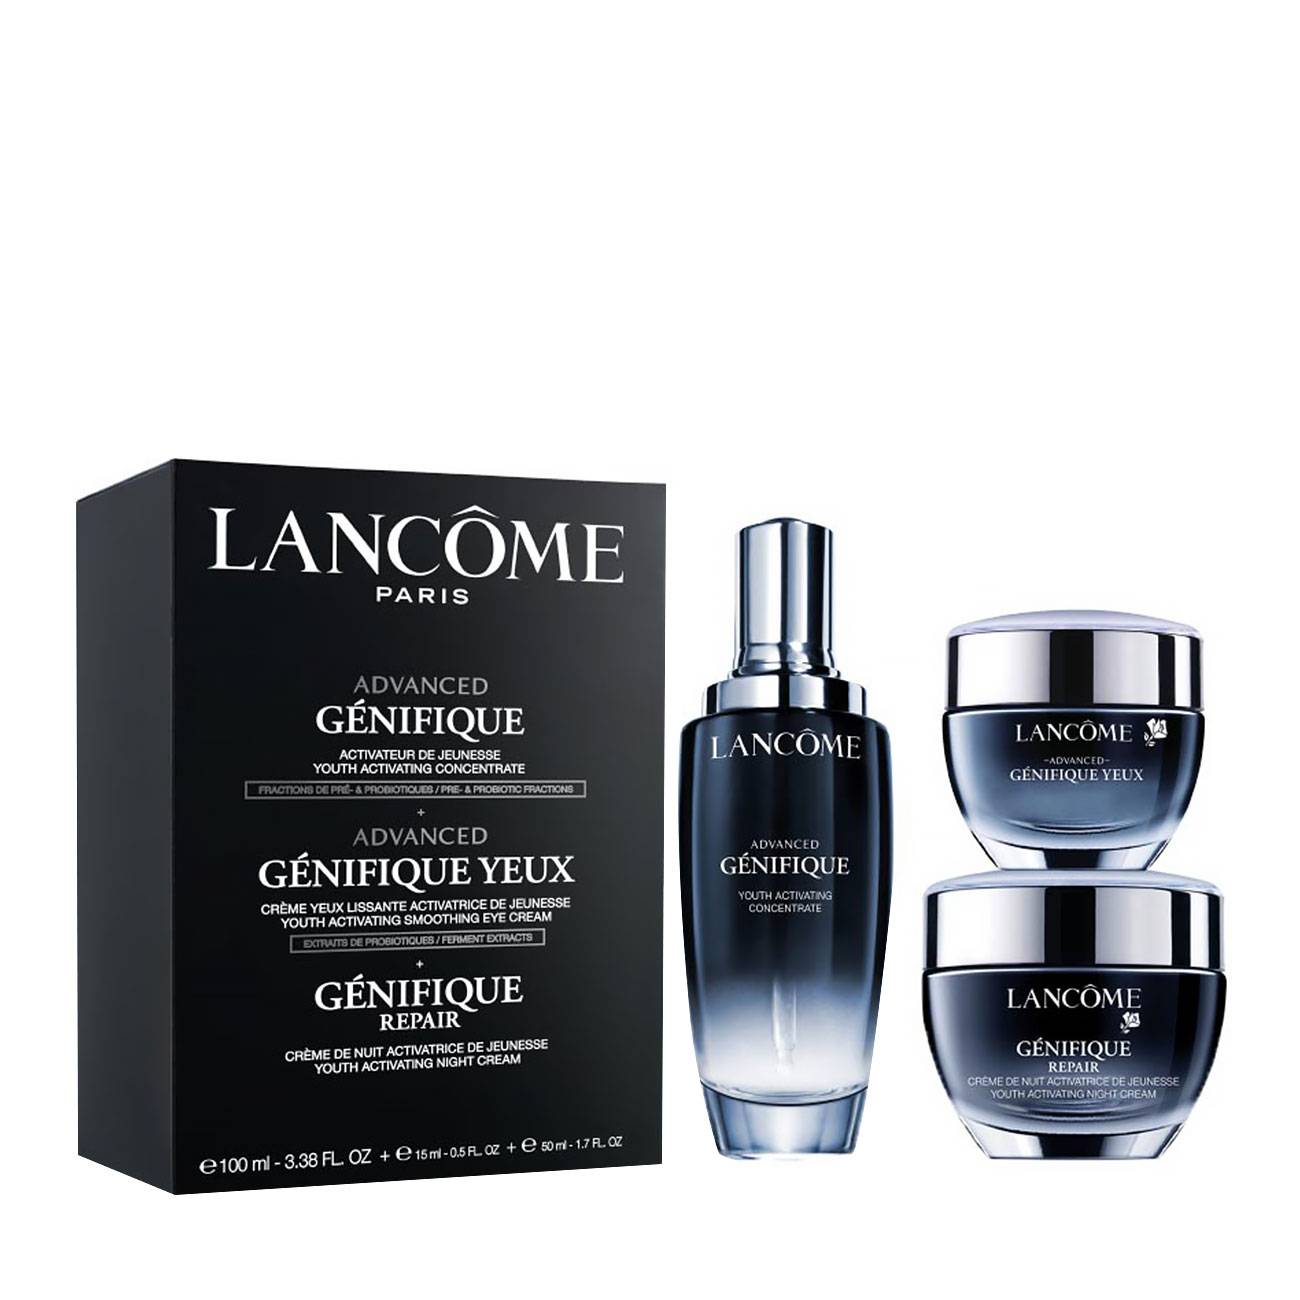 Genifique Set 165ml Lancôme imagine 2021 bestvalue.eu